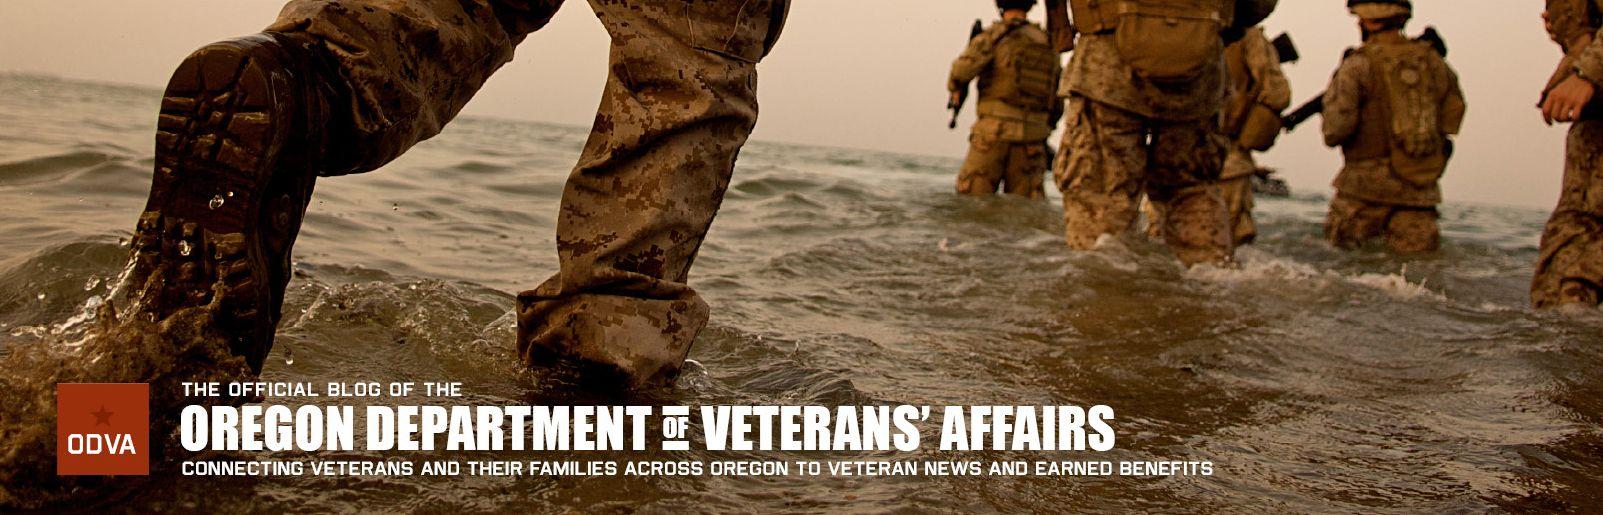 VA Announces Rollout of Secure Veteran Health